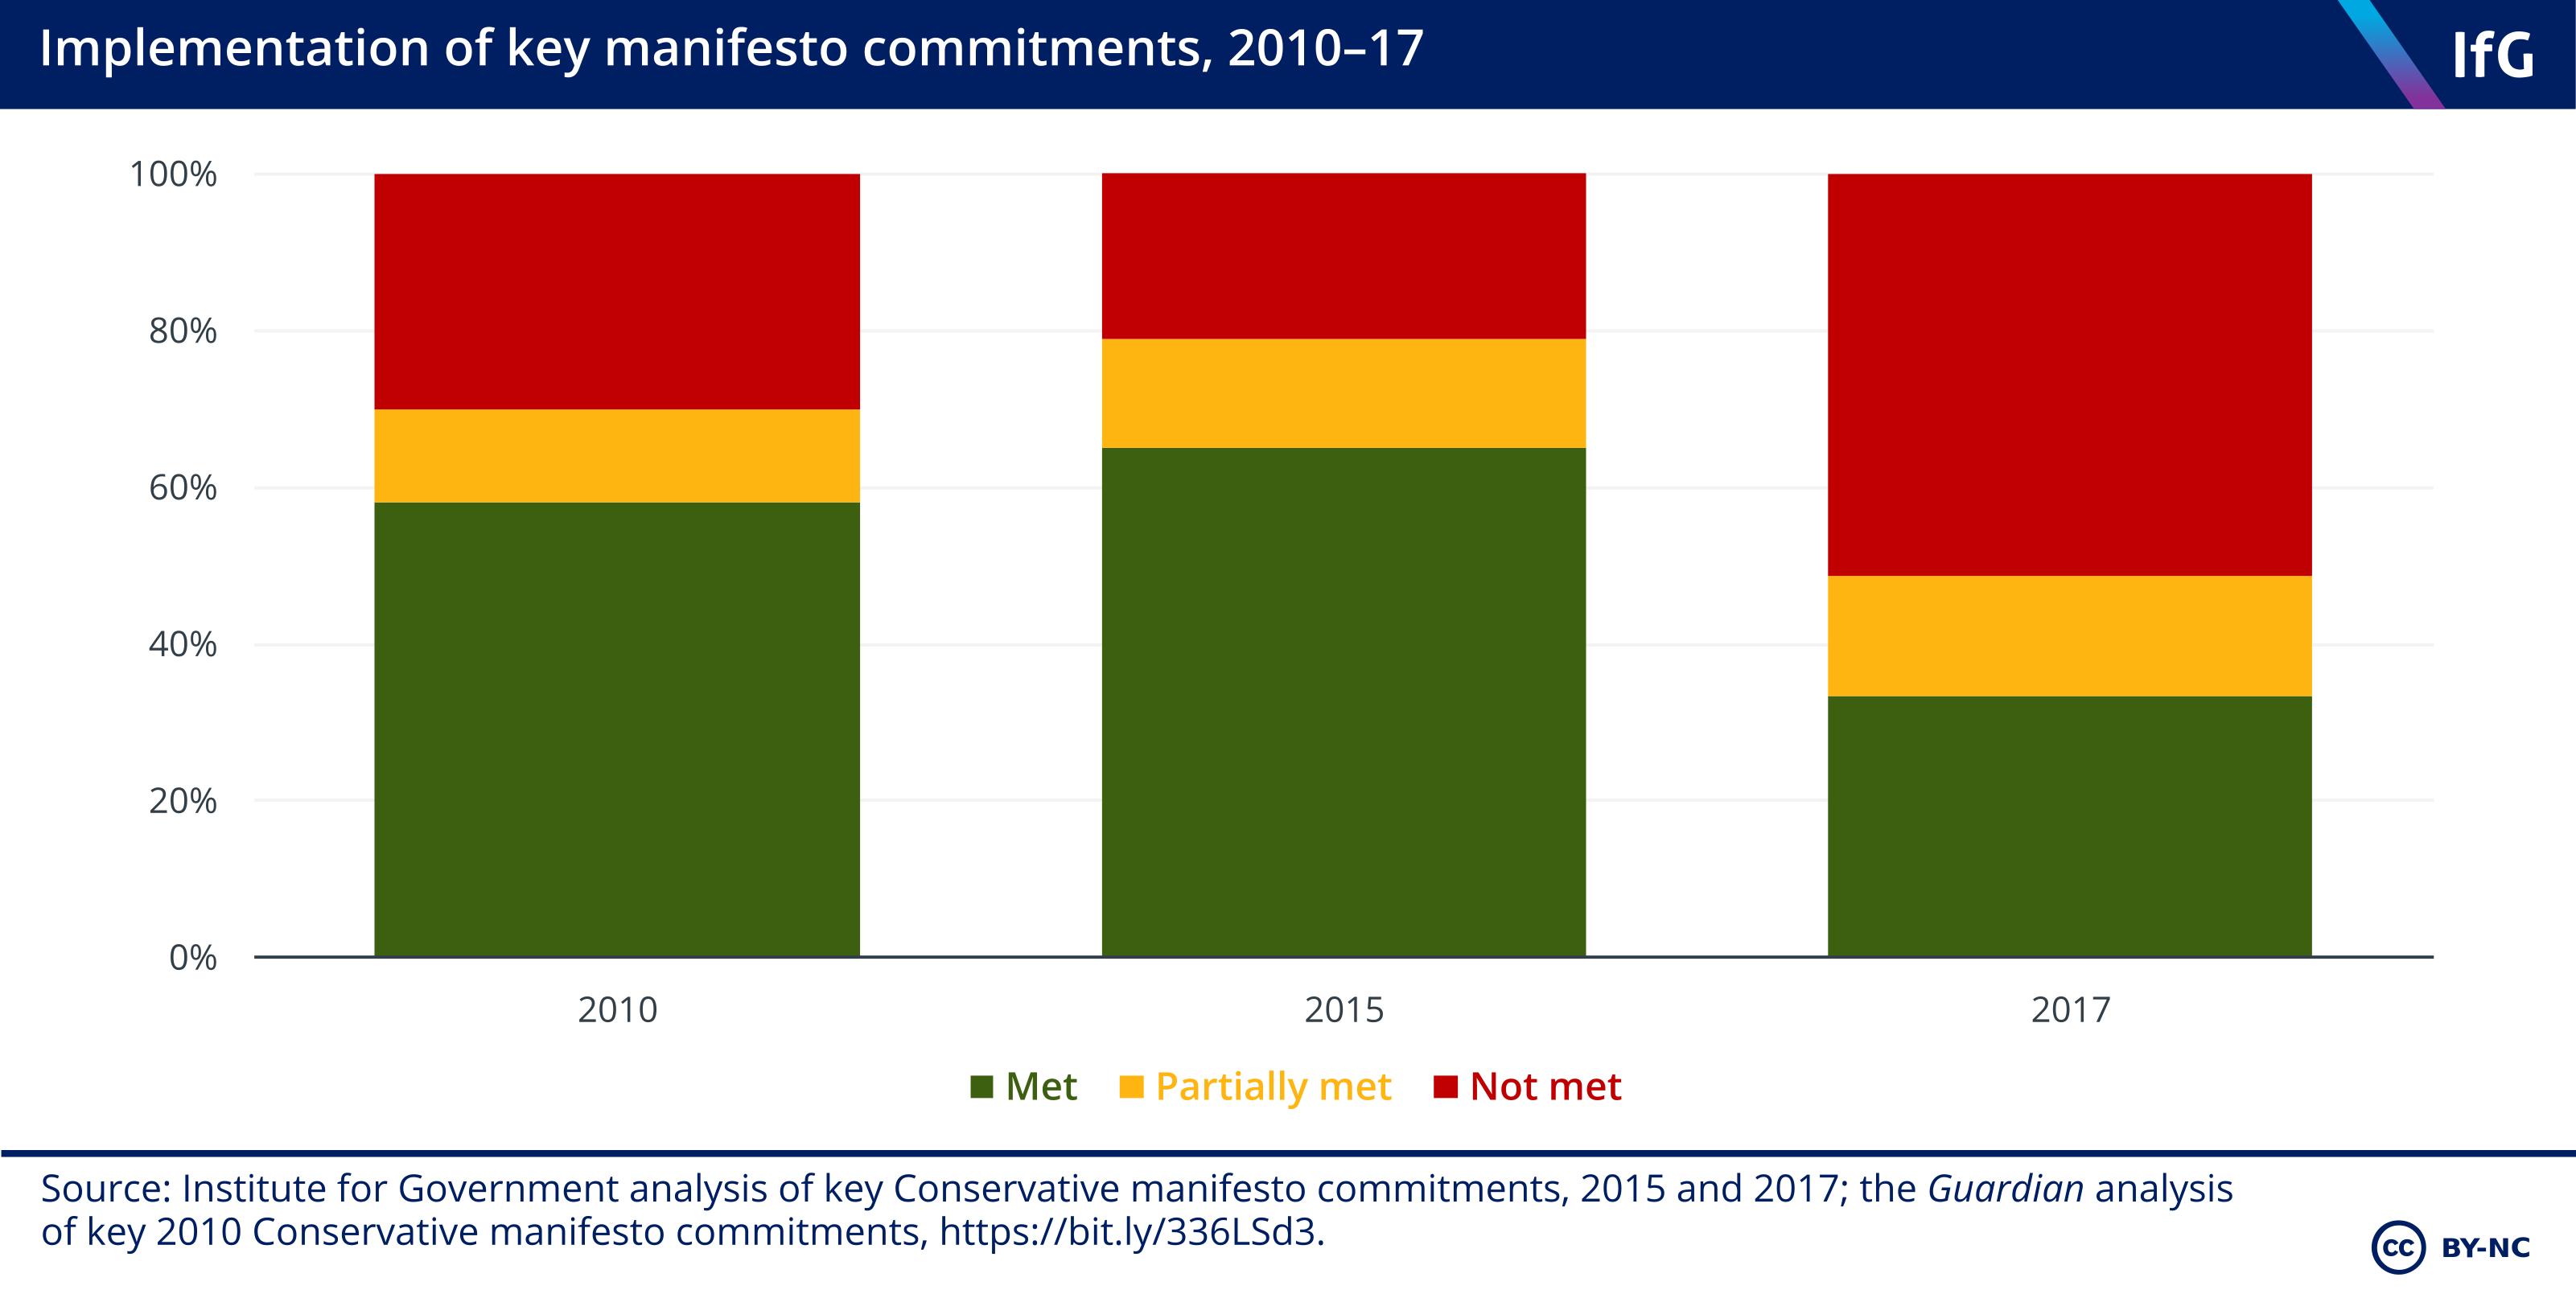 Implementation of manifesto promises, 2010-17